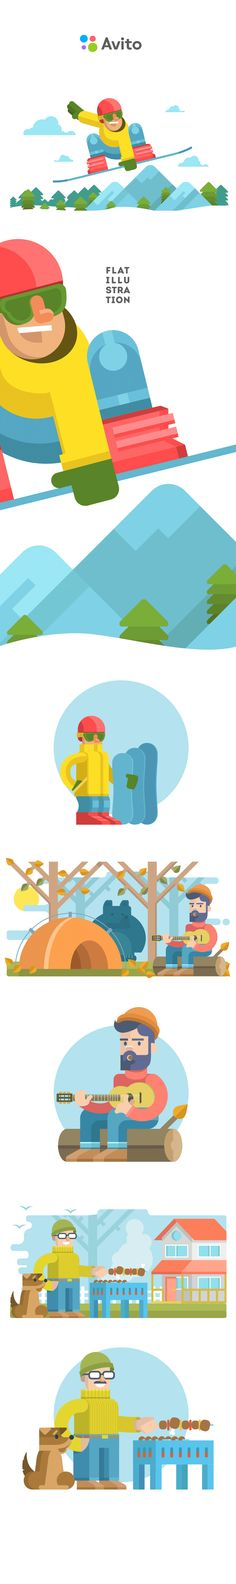 #flat_illustration Flat illustration for avito.ru https://www.behance.net/gallery/21410665/Flat-illustration-for-avitoru7eaf7a90e930555cd250697de14cb74c.gif (GIF Image, 717 × 4813 pixels)